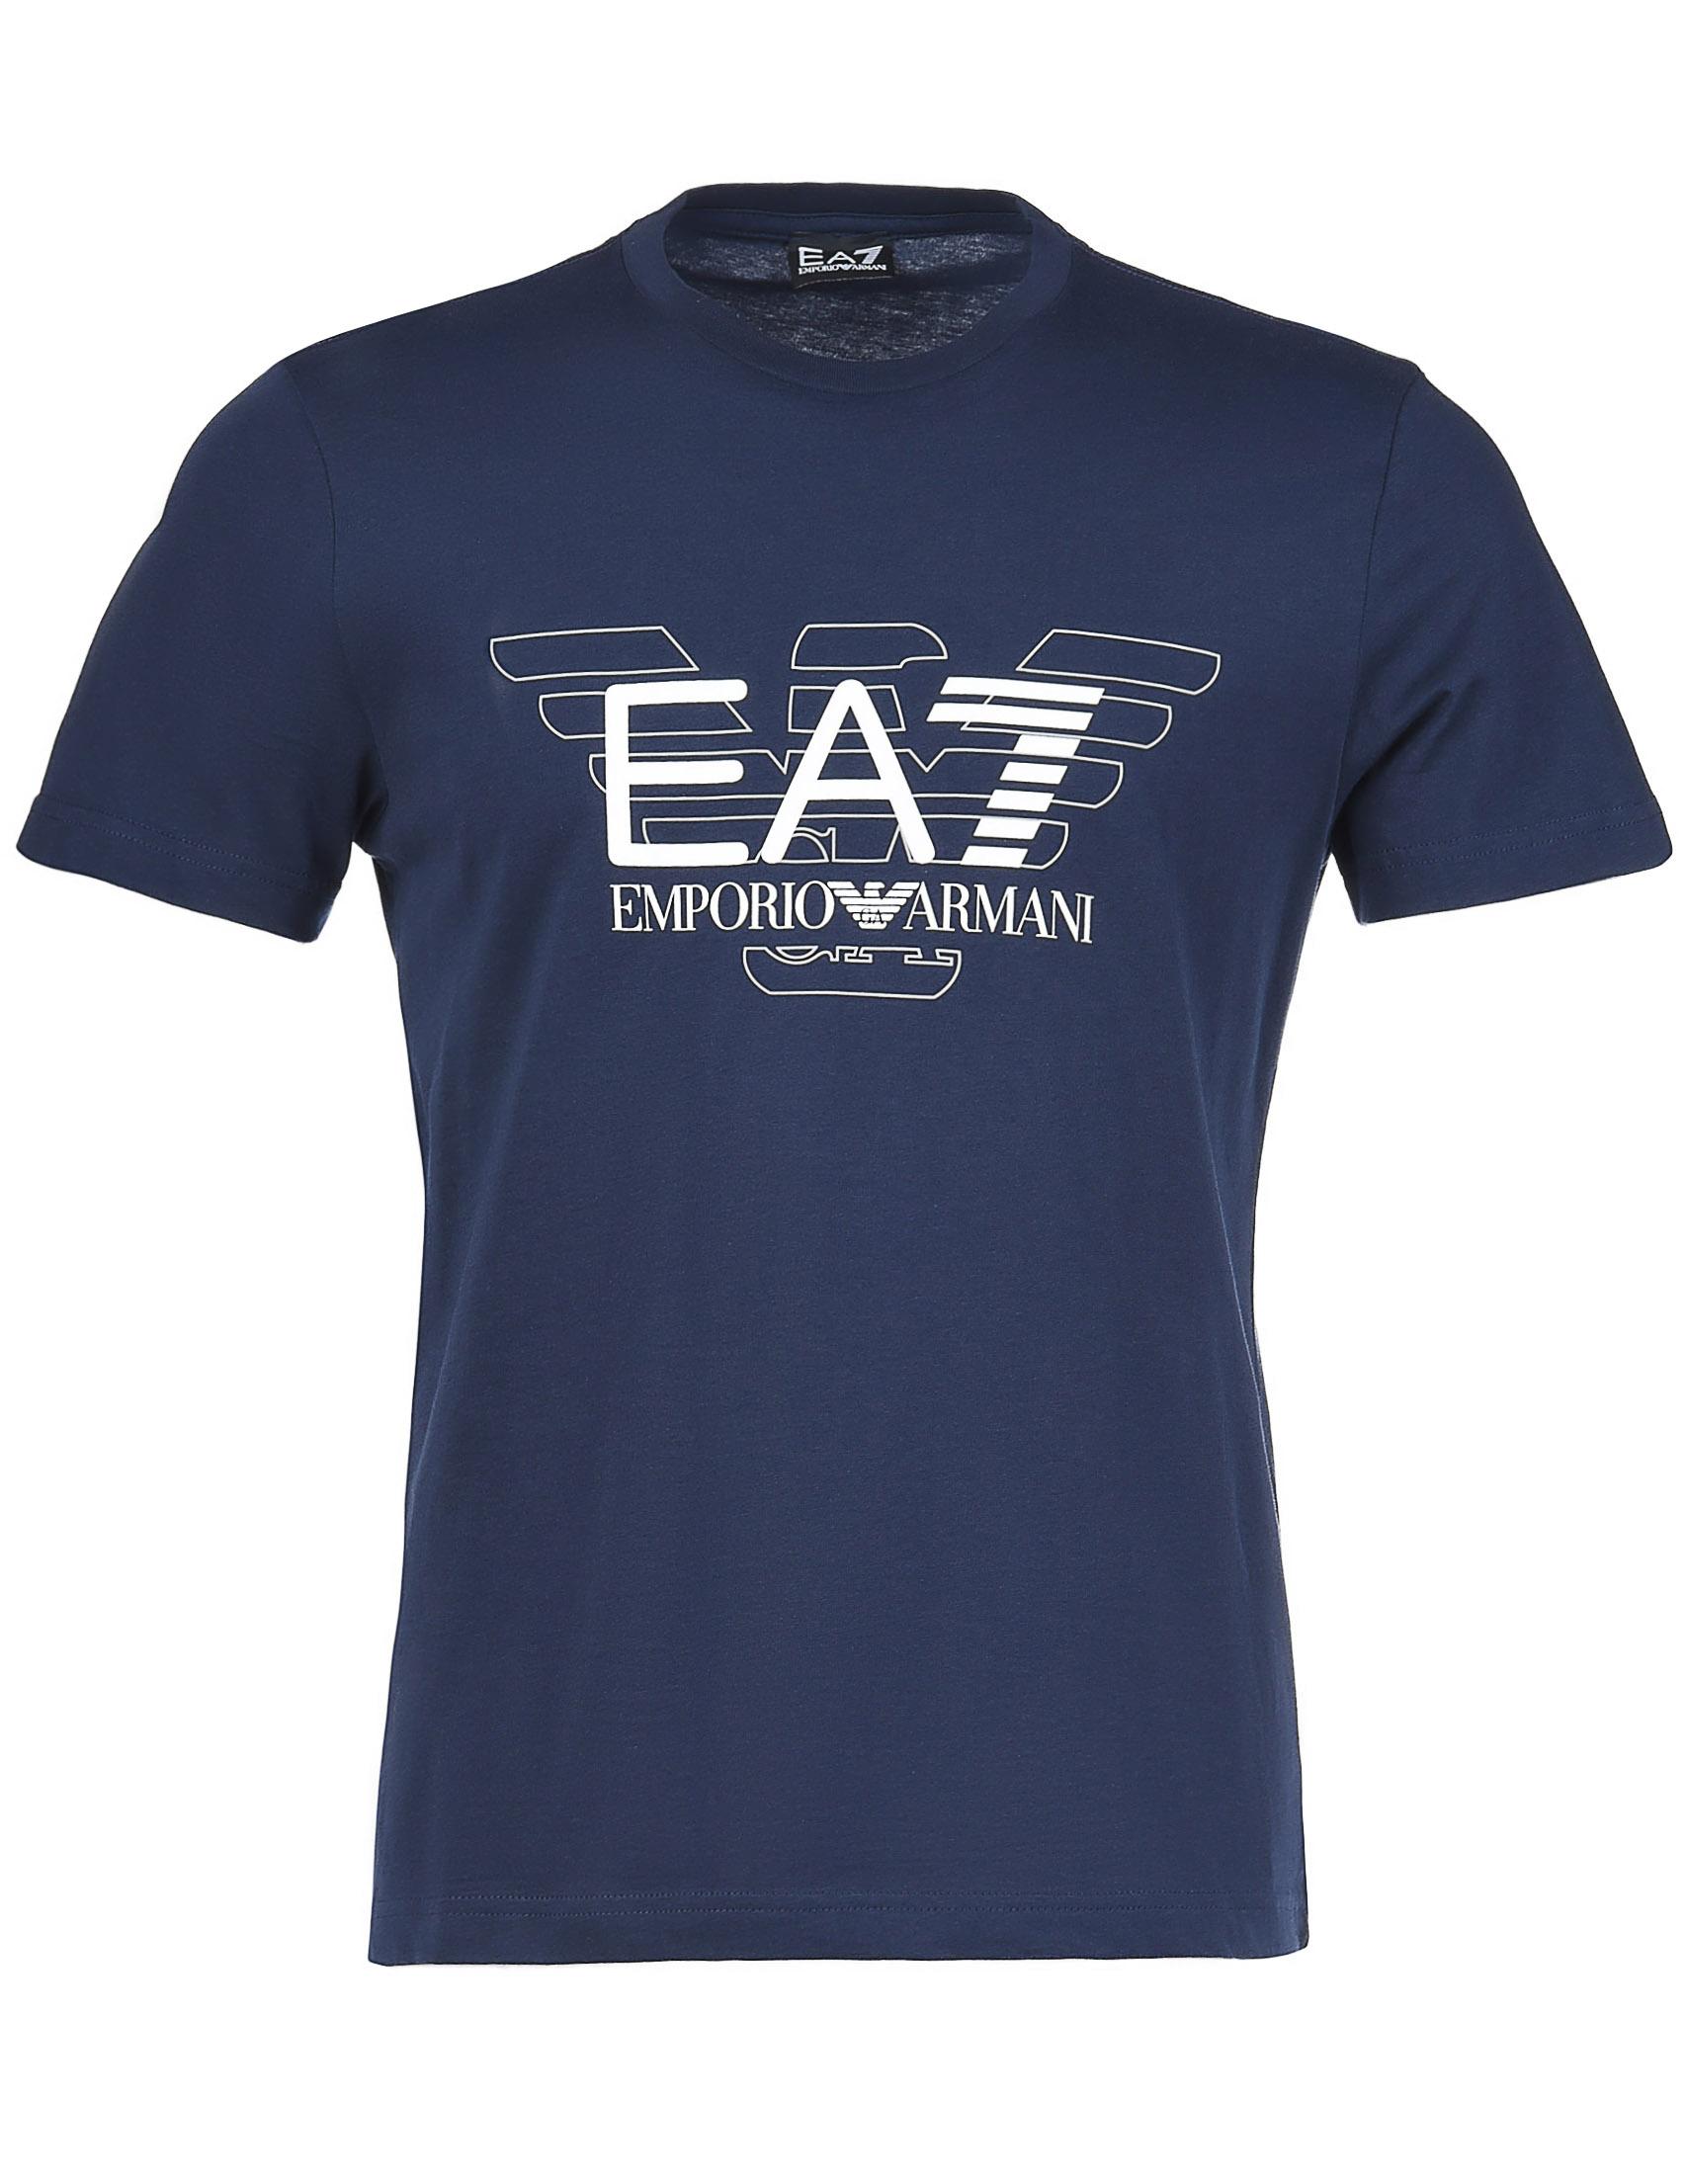 Купить Футболка, EA7 EMPORIO ARMANI, Синий, 100%Хлопок, Осень-Зима